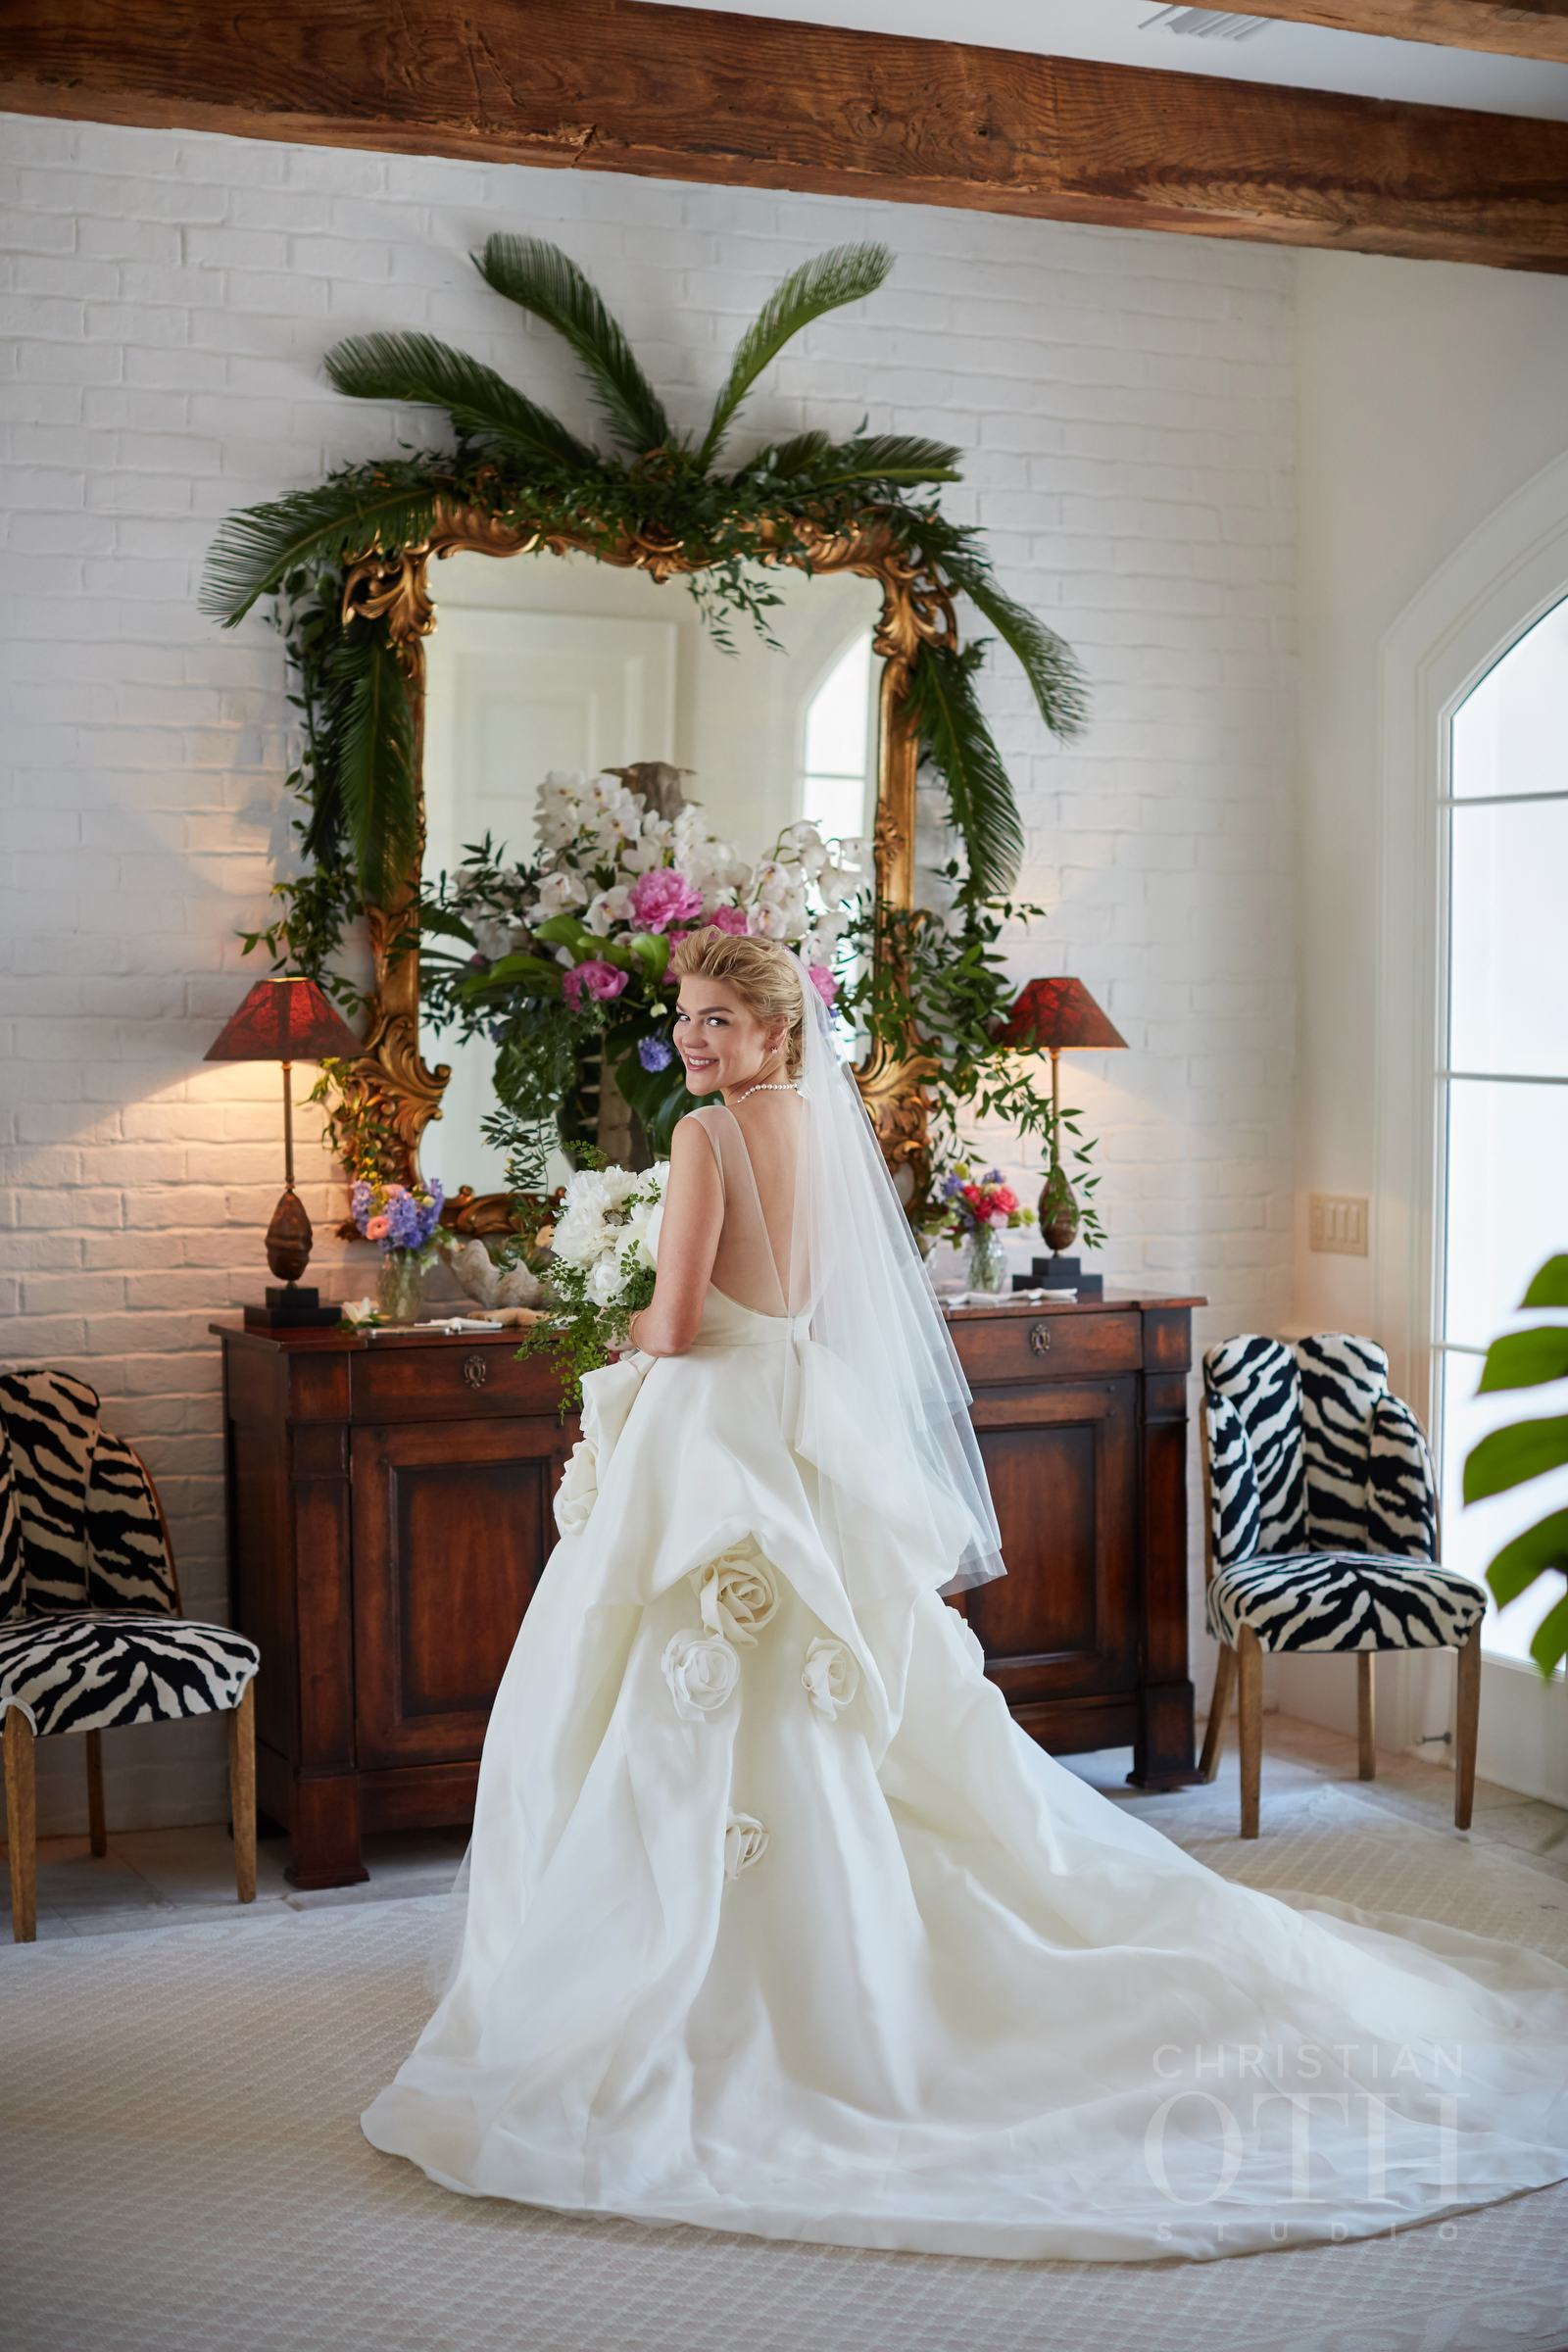 bridesmaids dresses various designer floor length dresses in shades of navy